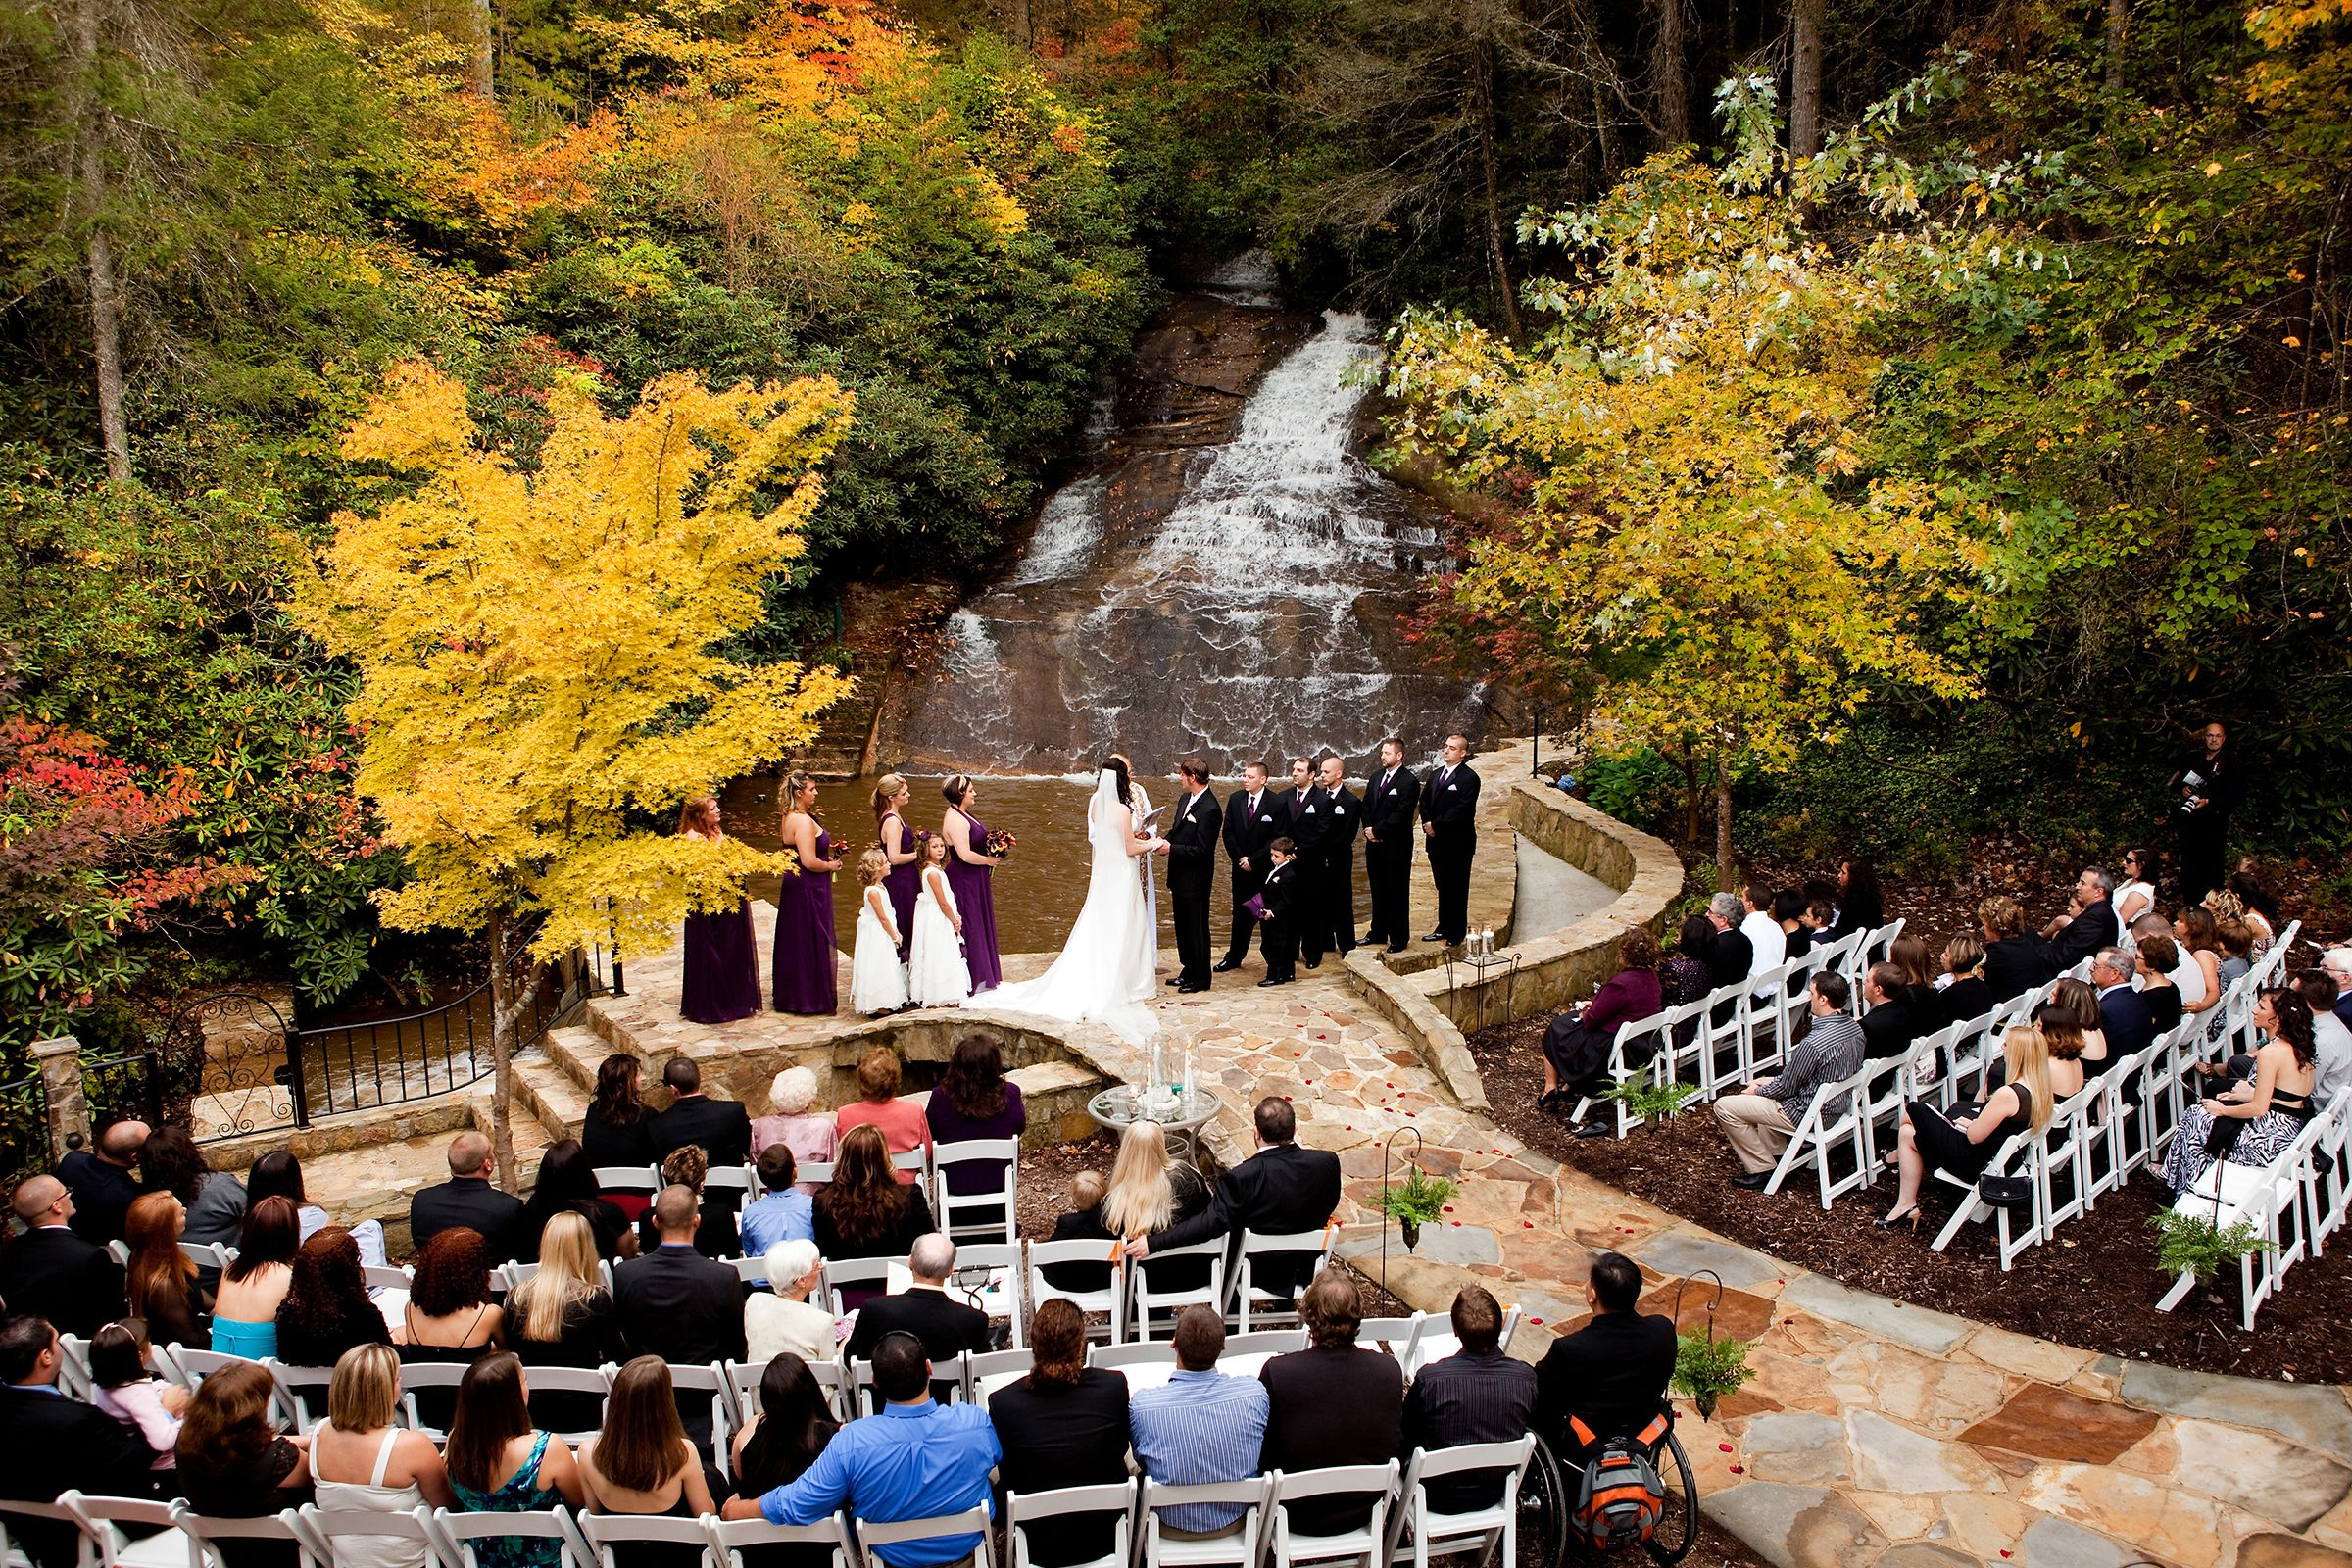 Wedding Venues In Georgia Newest U2013 Navokal.com